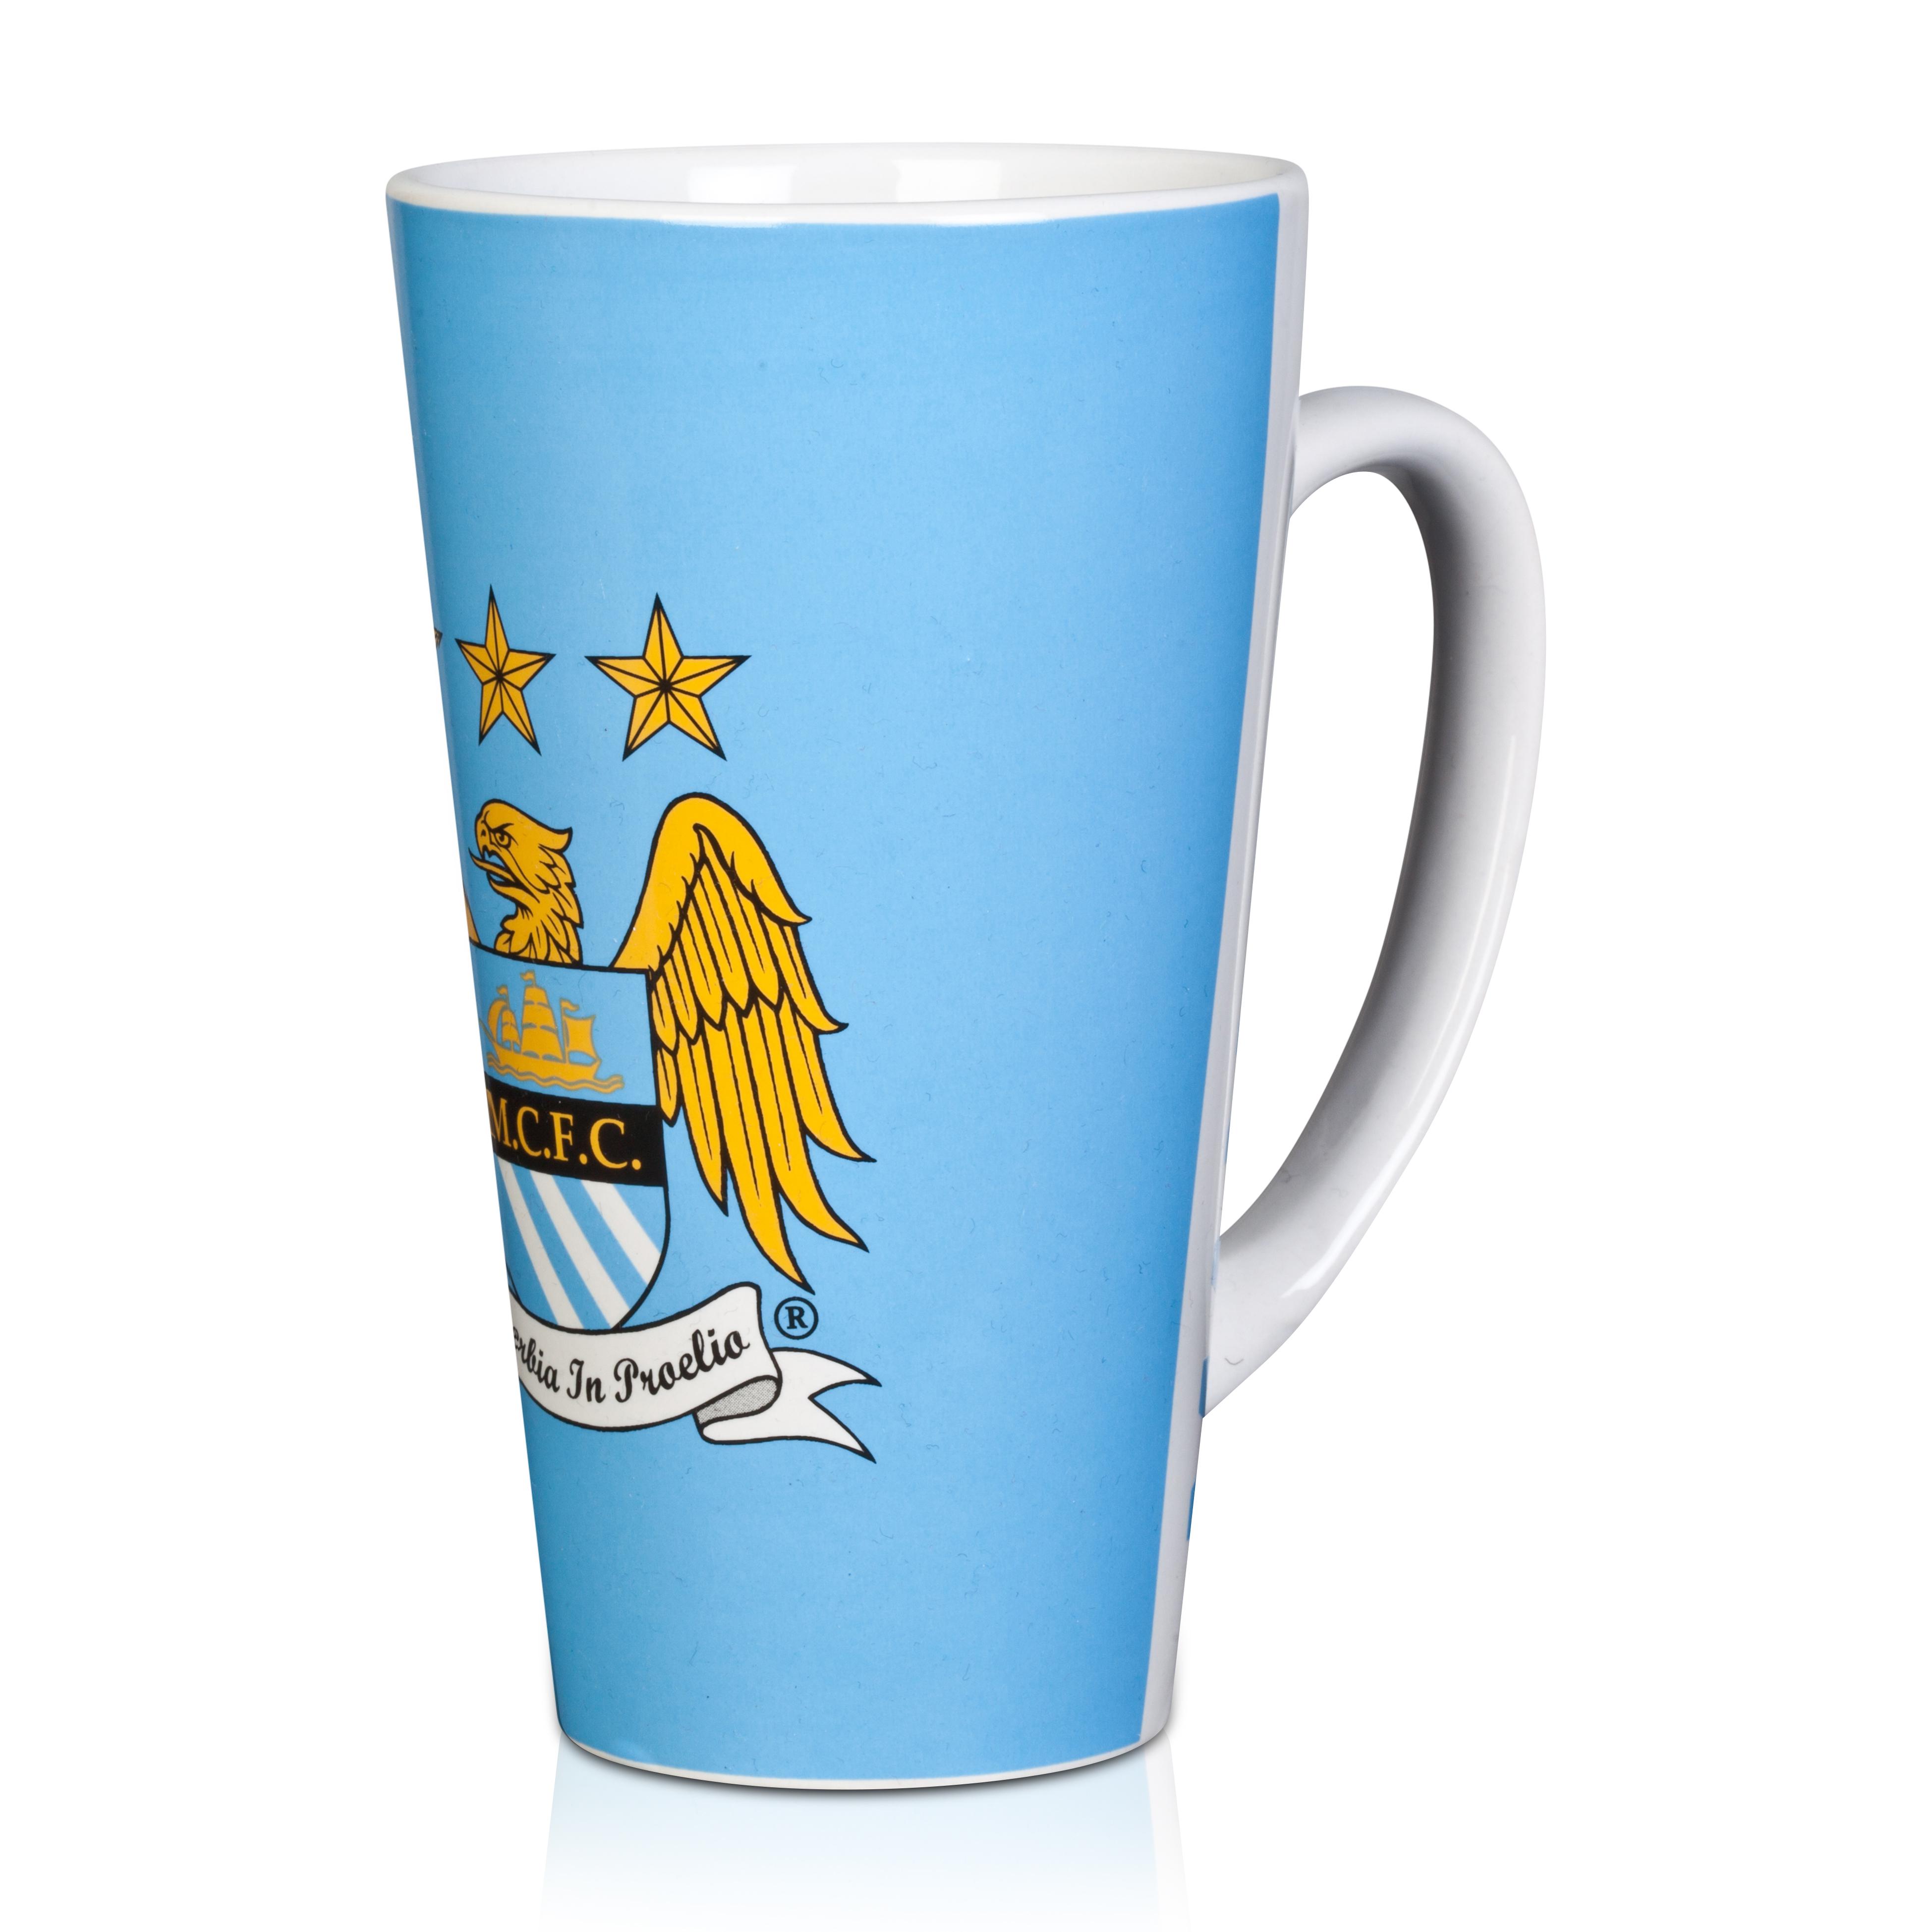 Manchester City Latte Mug